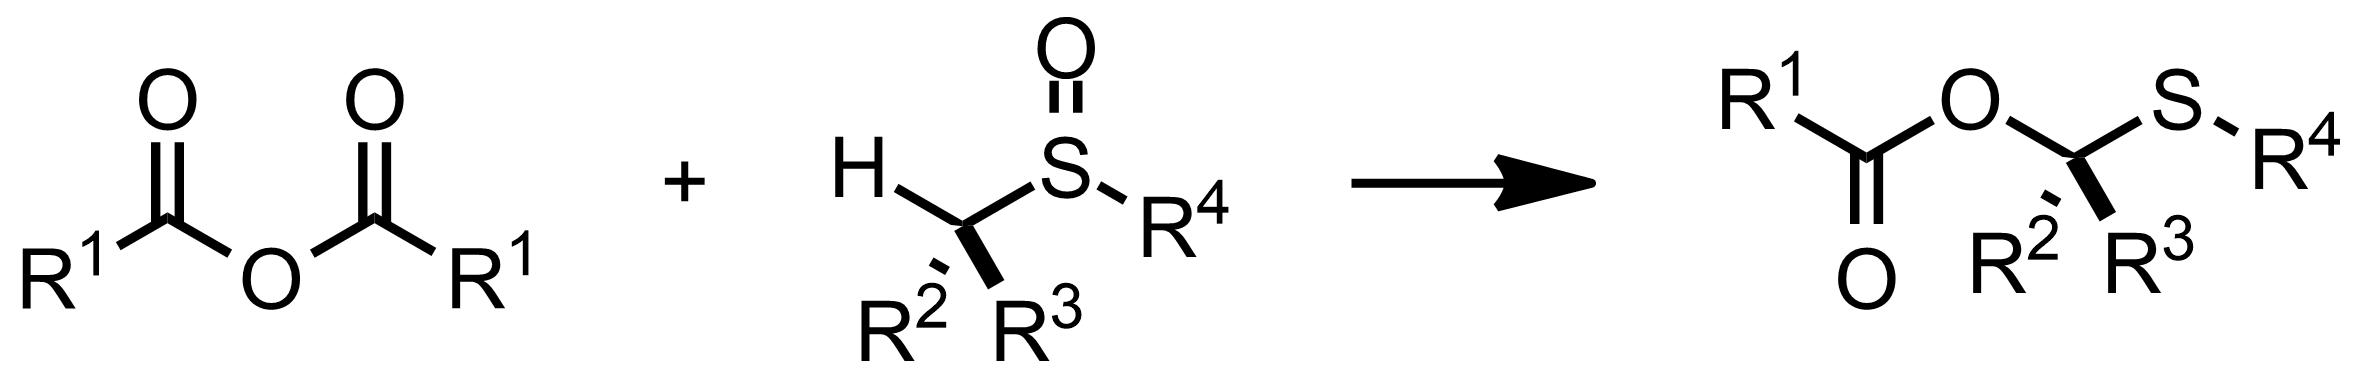 Schematic representation of the Pummerer Rearrangement.